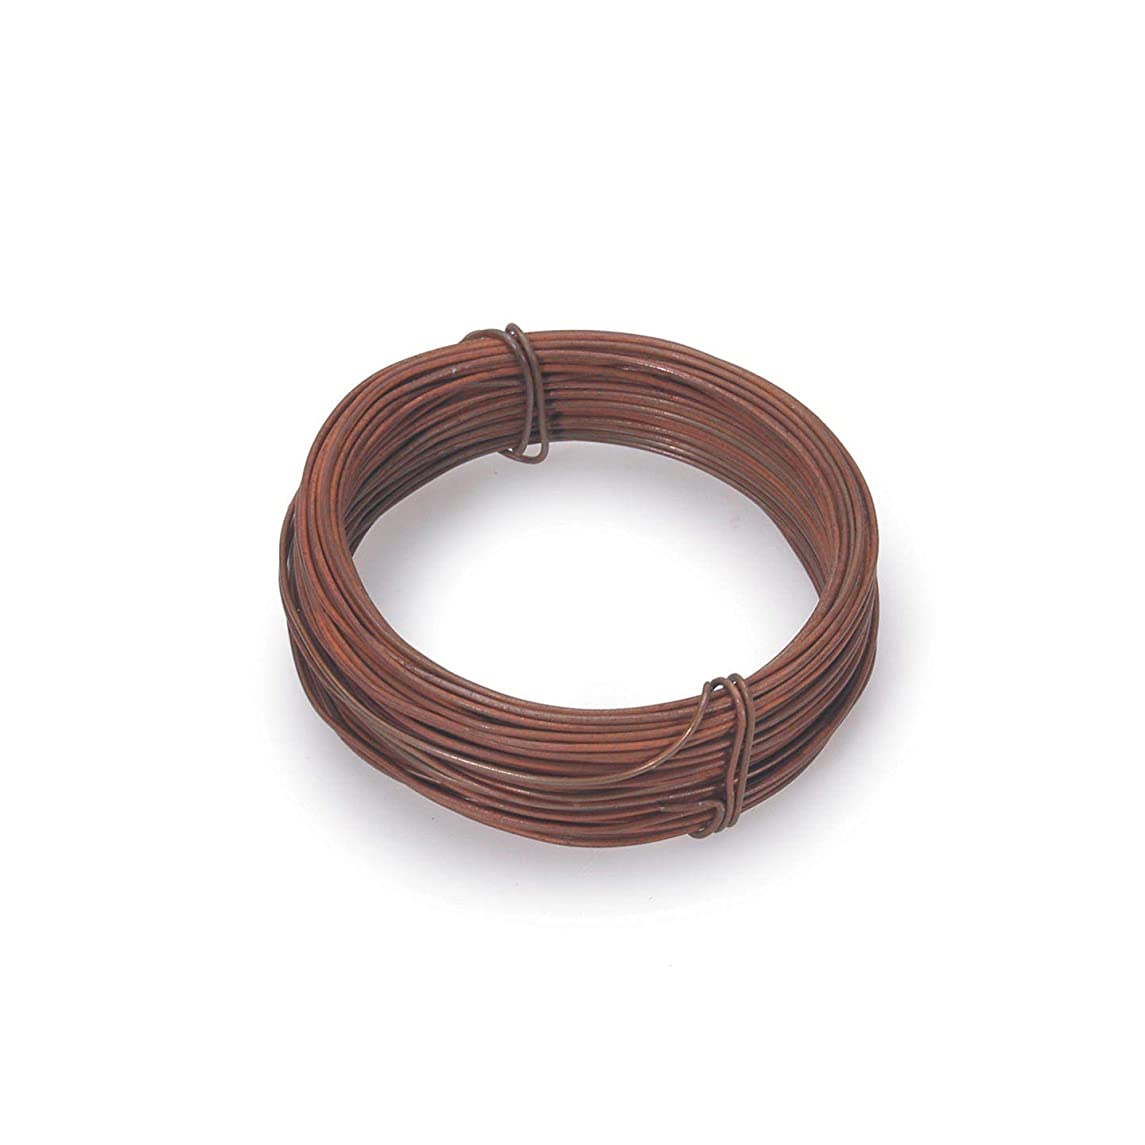 Bulk Buy: Darice DIY Crafts Rusted Wire Number 22 30 feet (3-Pack) 6551-55